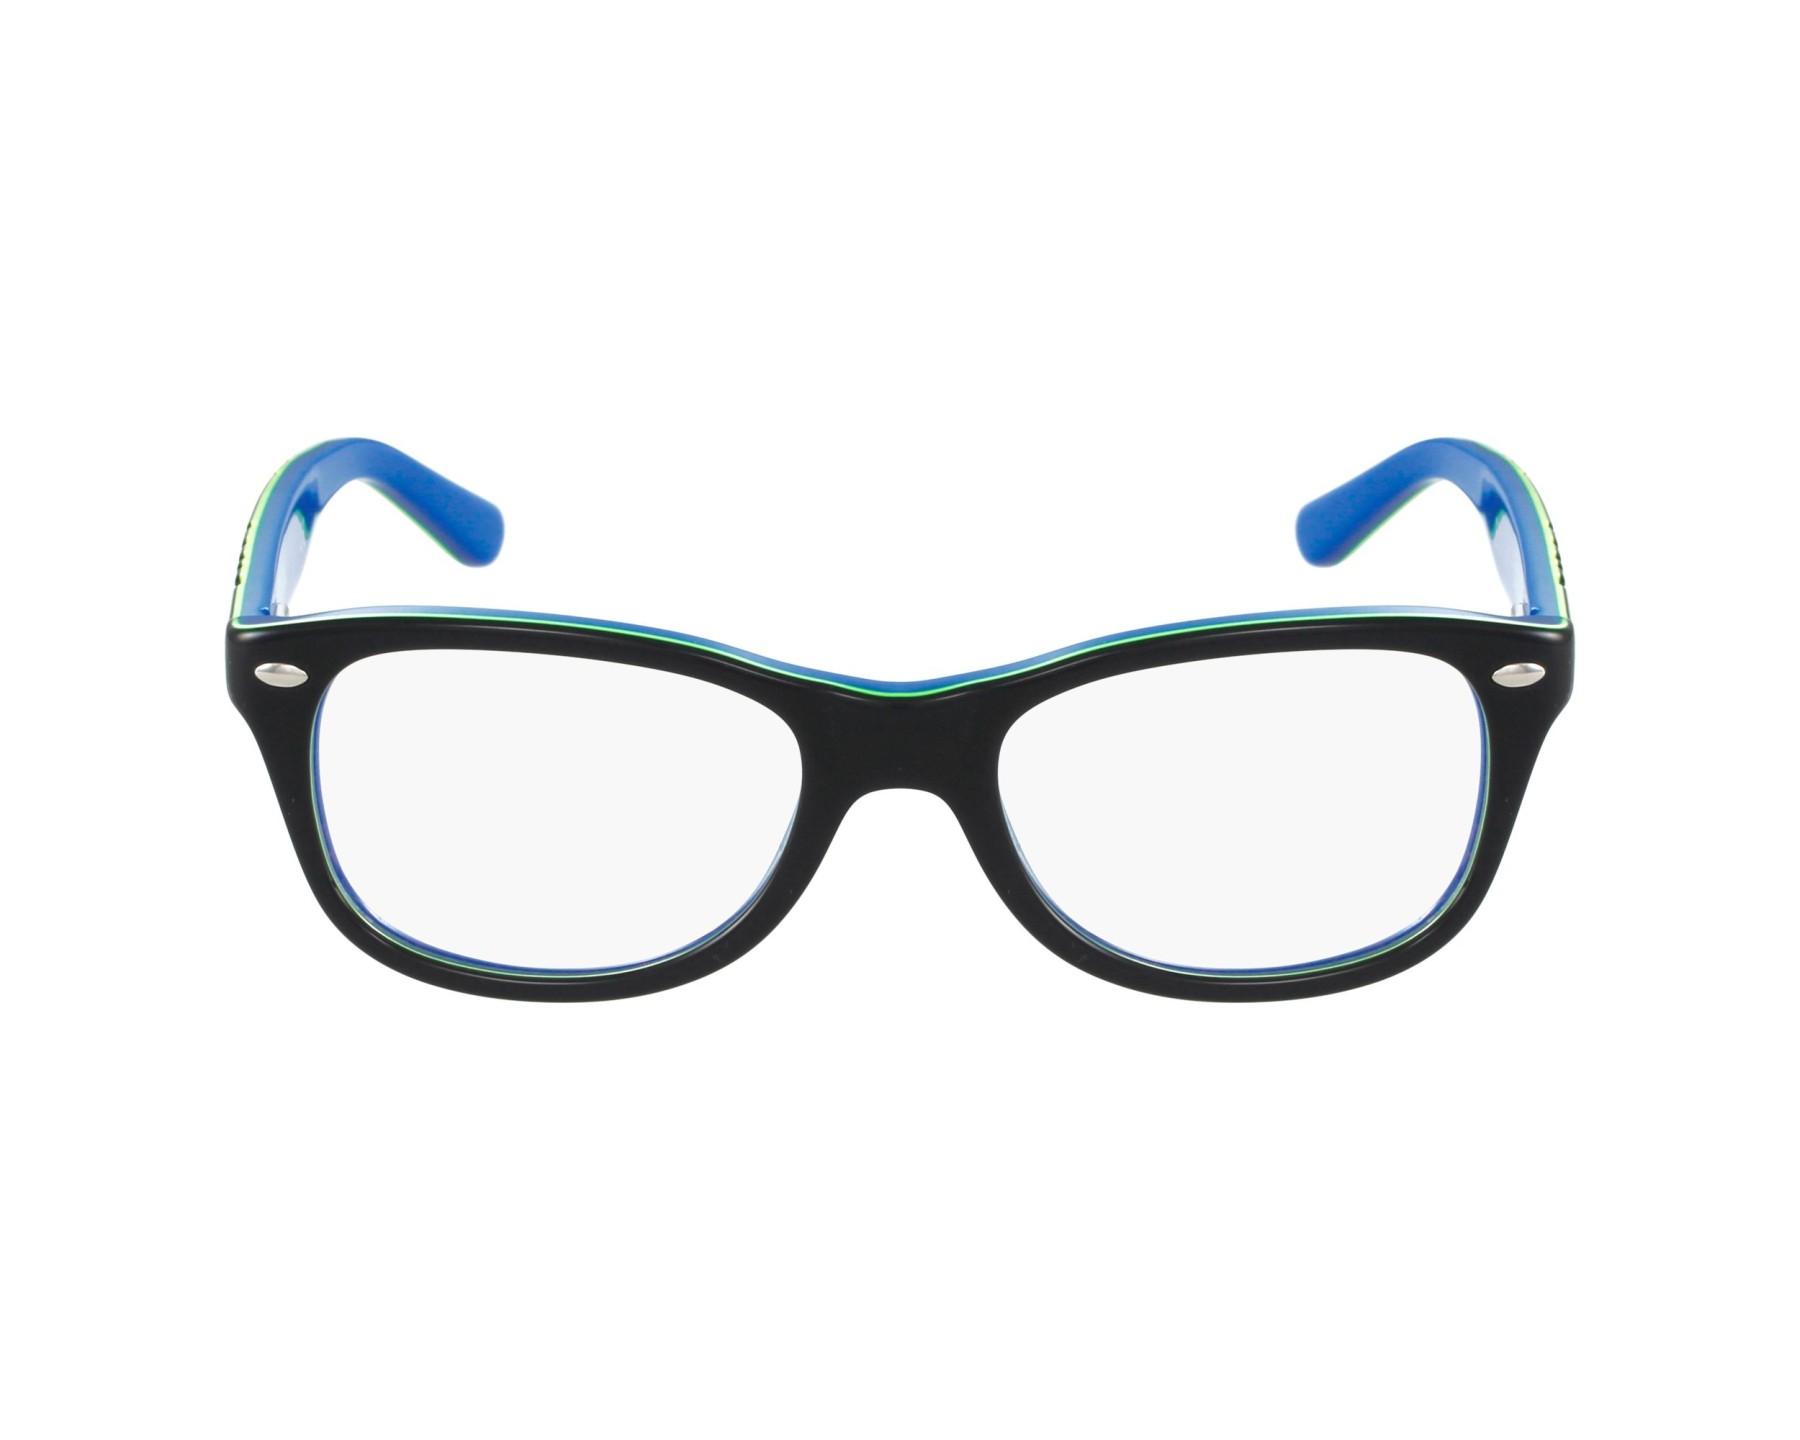 43b1c976b4c27 Lunettes de vue Ray-Ban RY-1544 3600 - Bleu Vert vue de profil